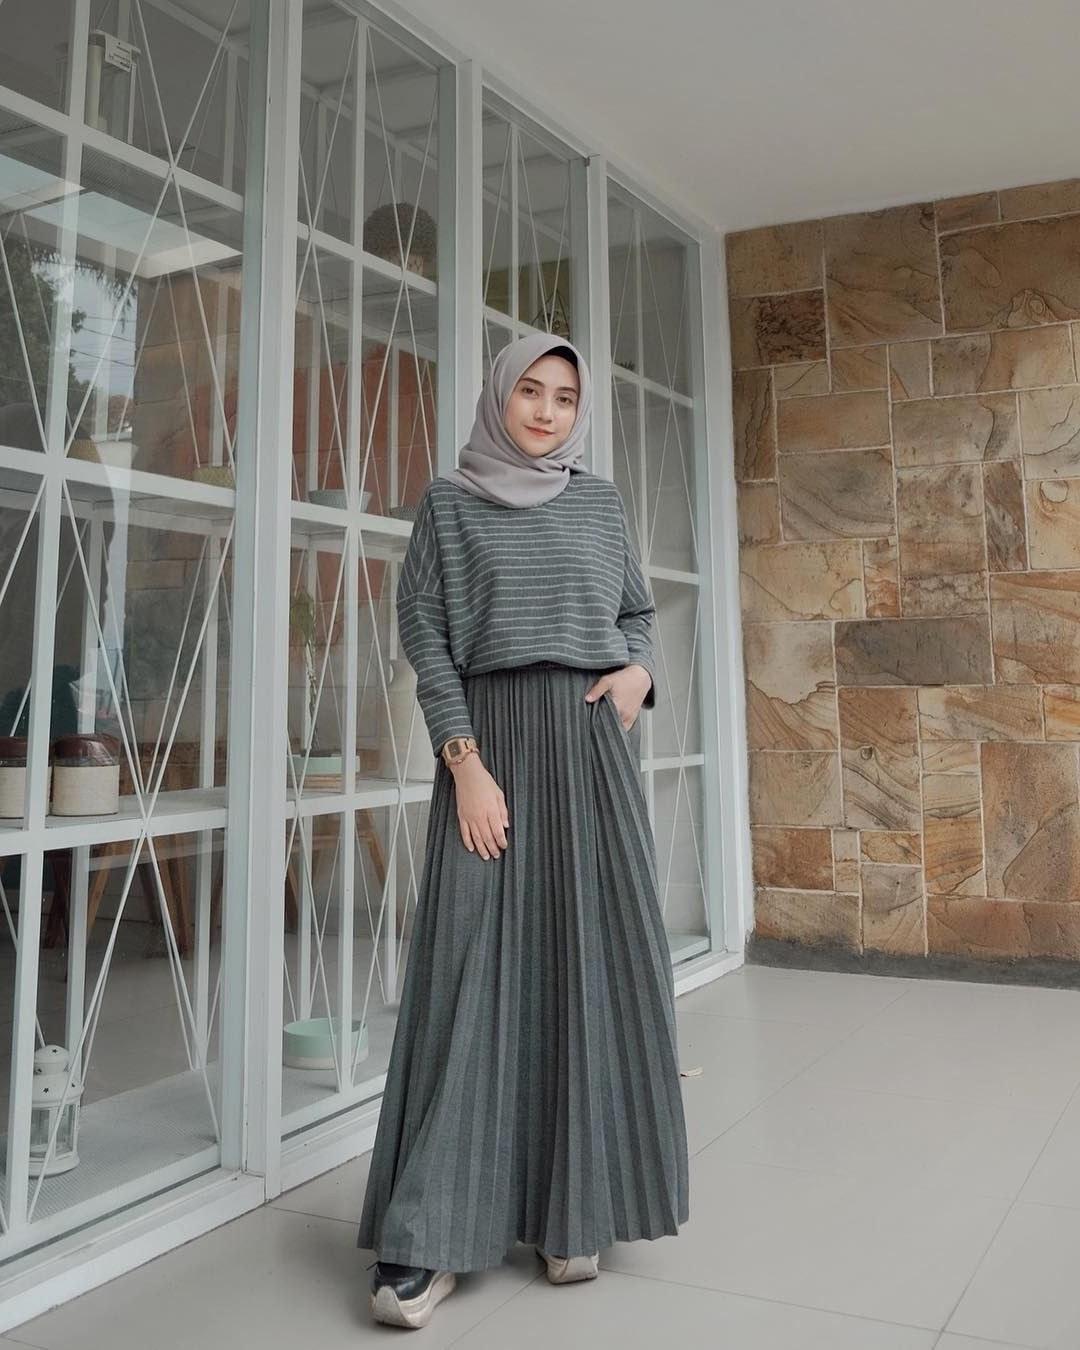 Ide Baju Lebaran Wanita Terbaru 2019 Tqd3 Baju Muslim Lebaran Terbaru 2019 Dengan Gambar